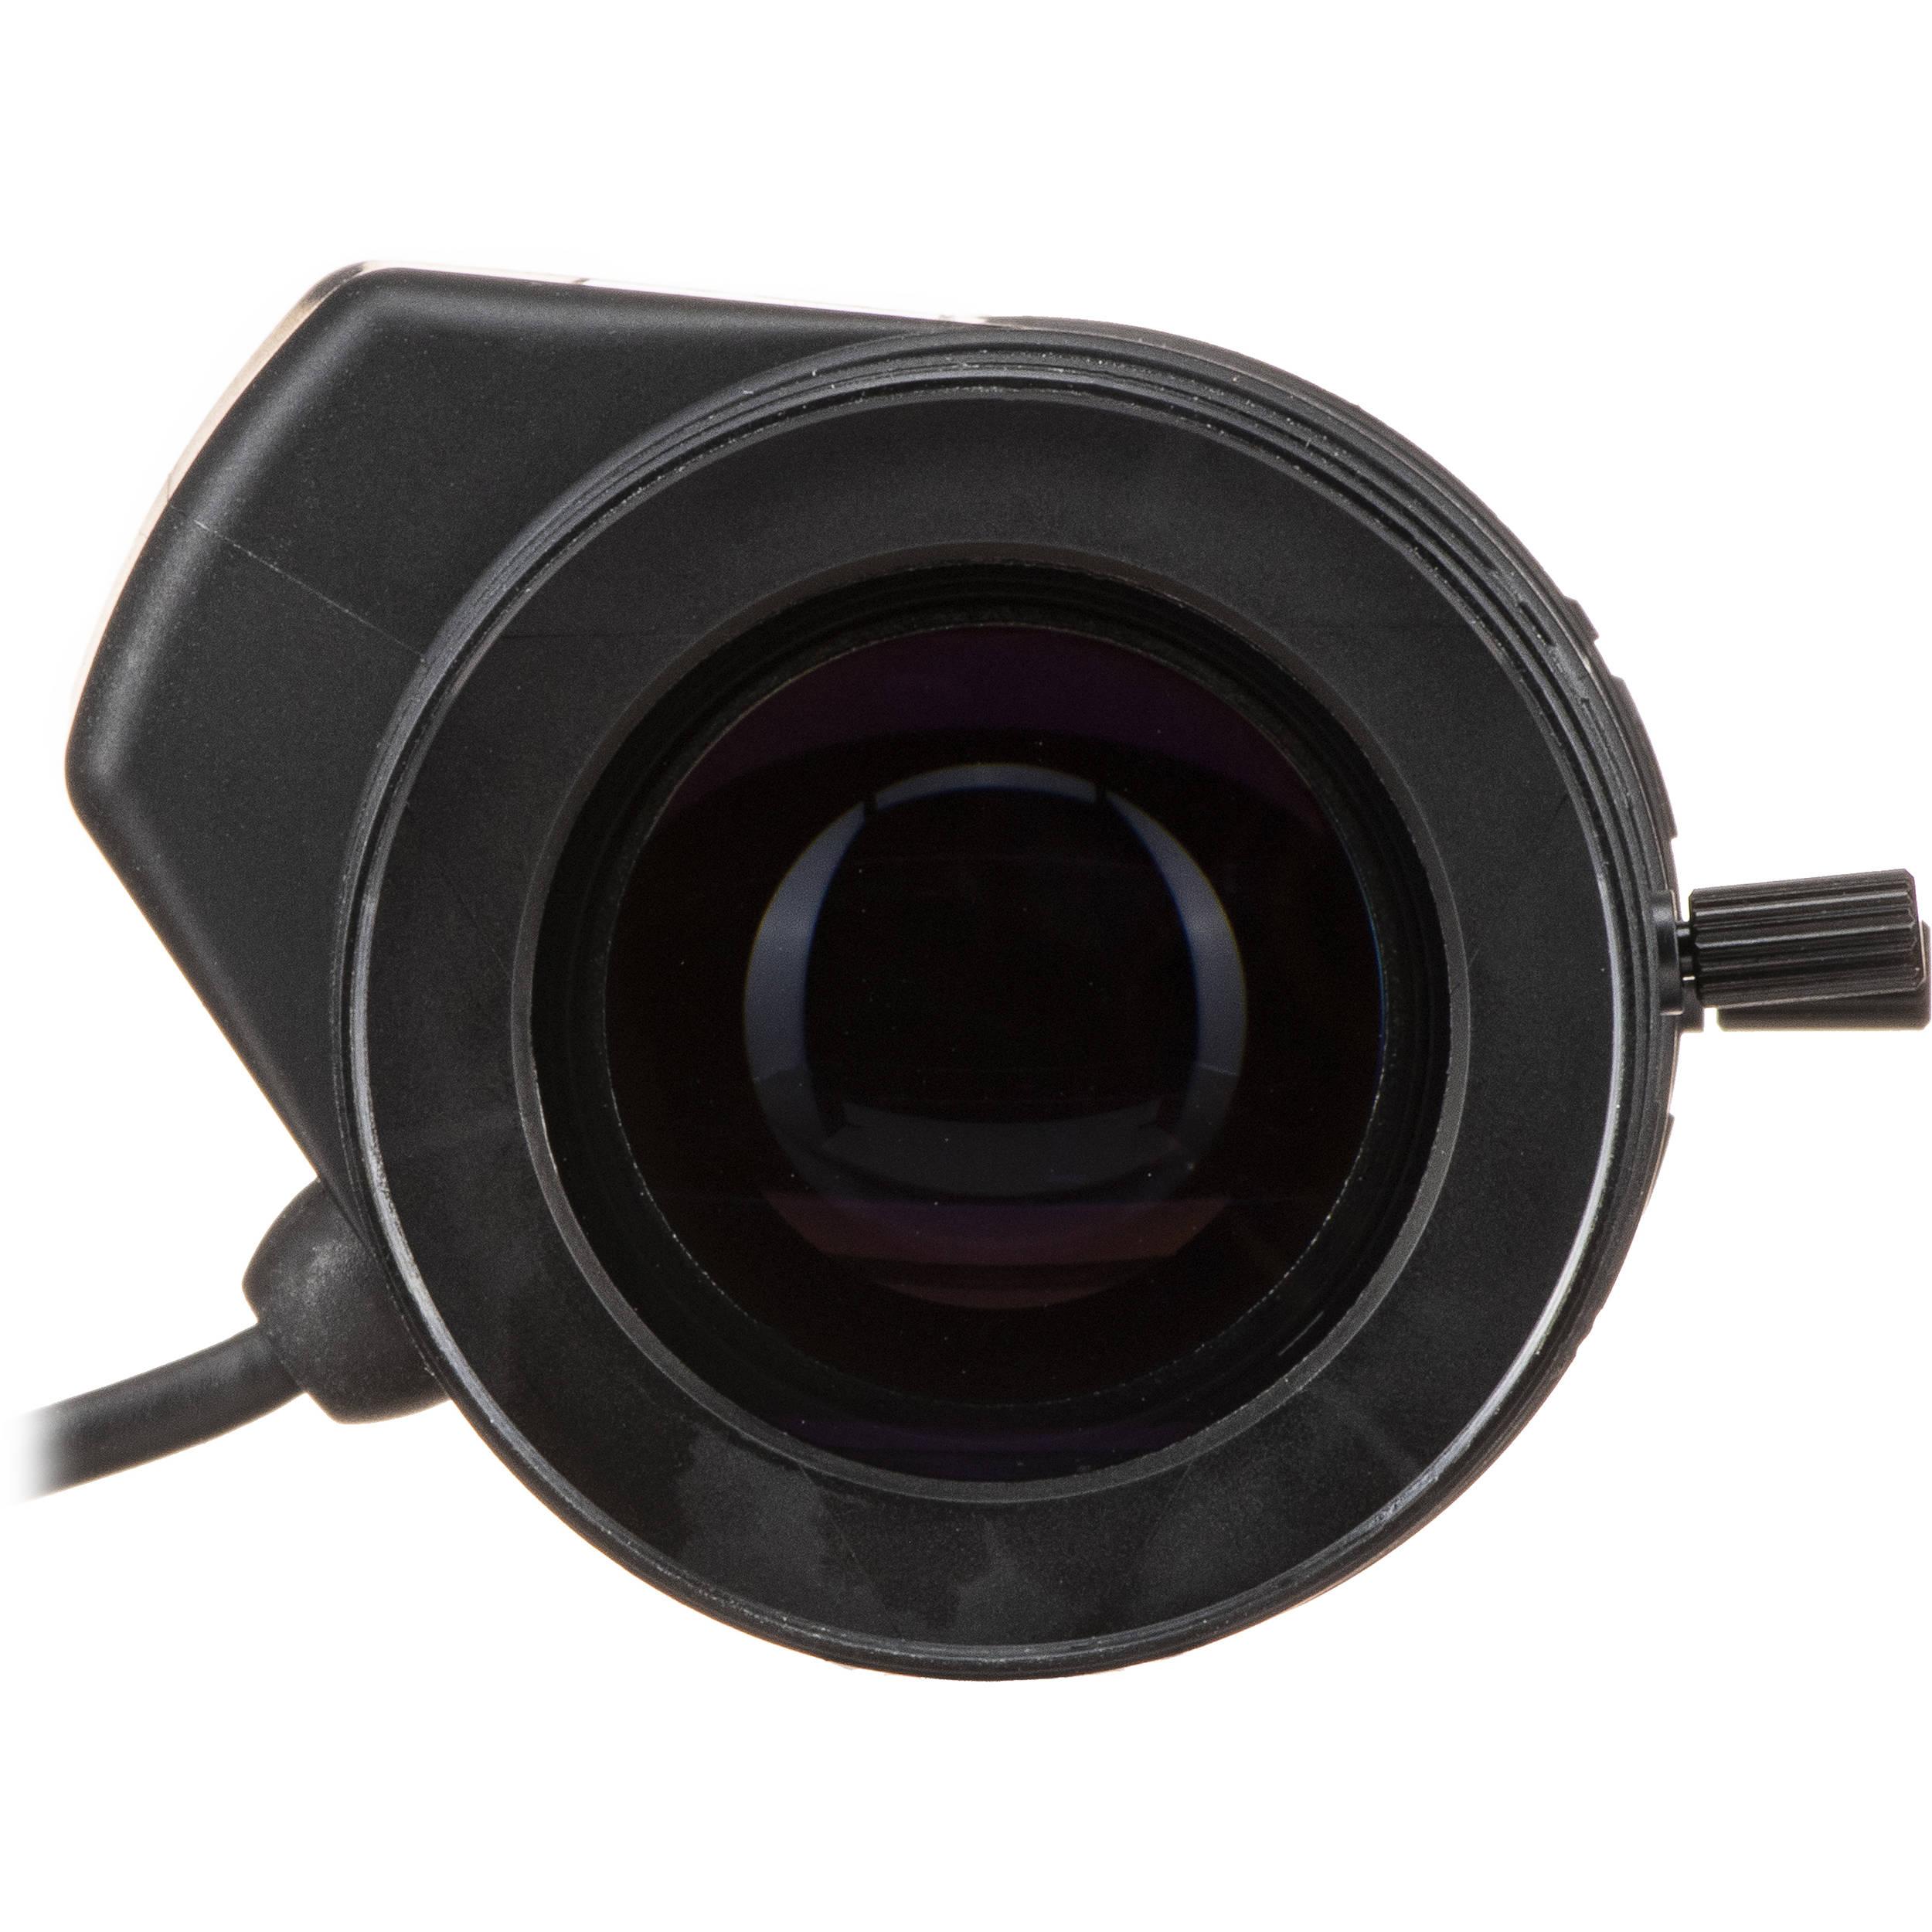 Computar TG10Z0513FCS 5-50mm Varifocal ZoomDC Auto-Iris CCTV CS Lens FACTORY NEW